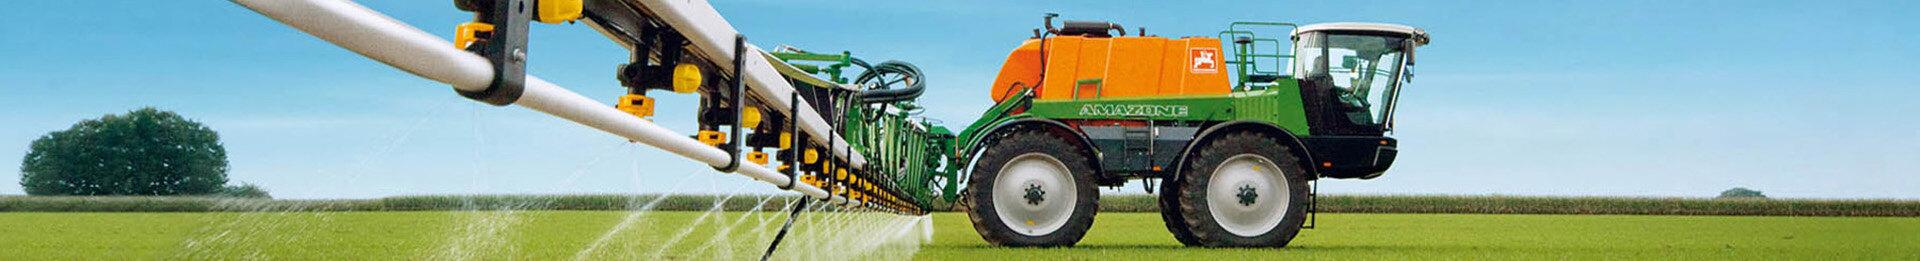 FARM FLEET DEALER IN NEW LISKEARD, ONTARIO, EBERT WELDING LTD